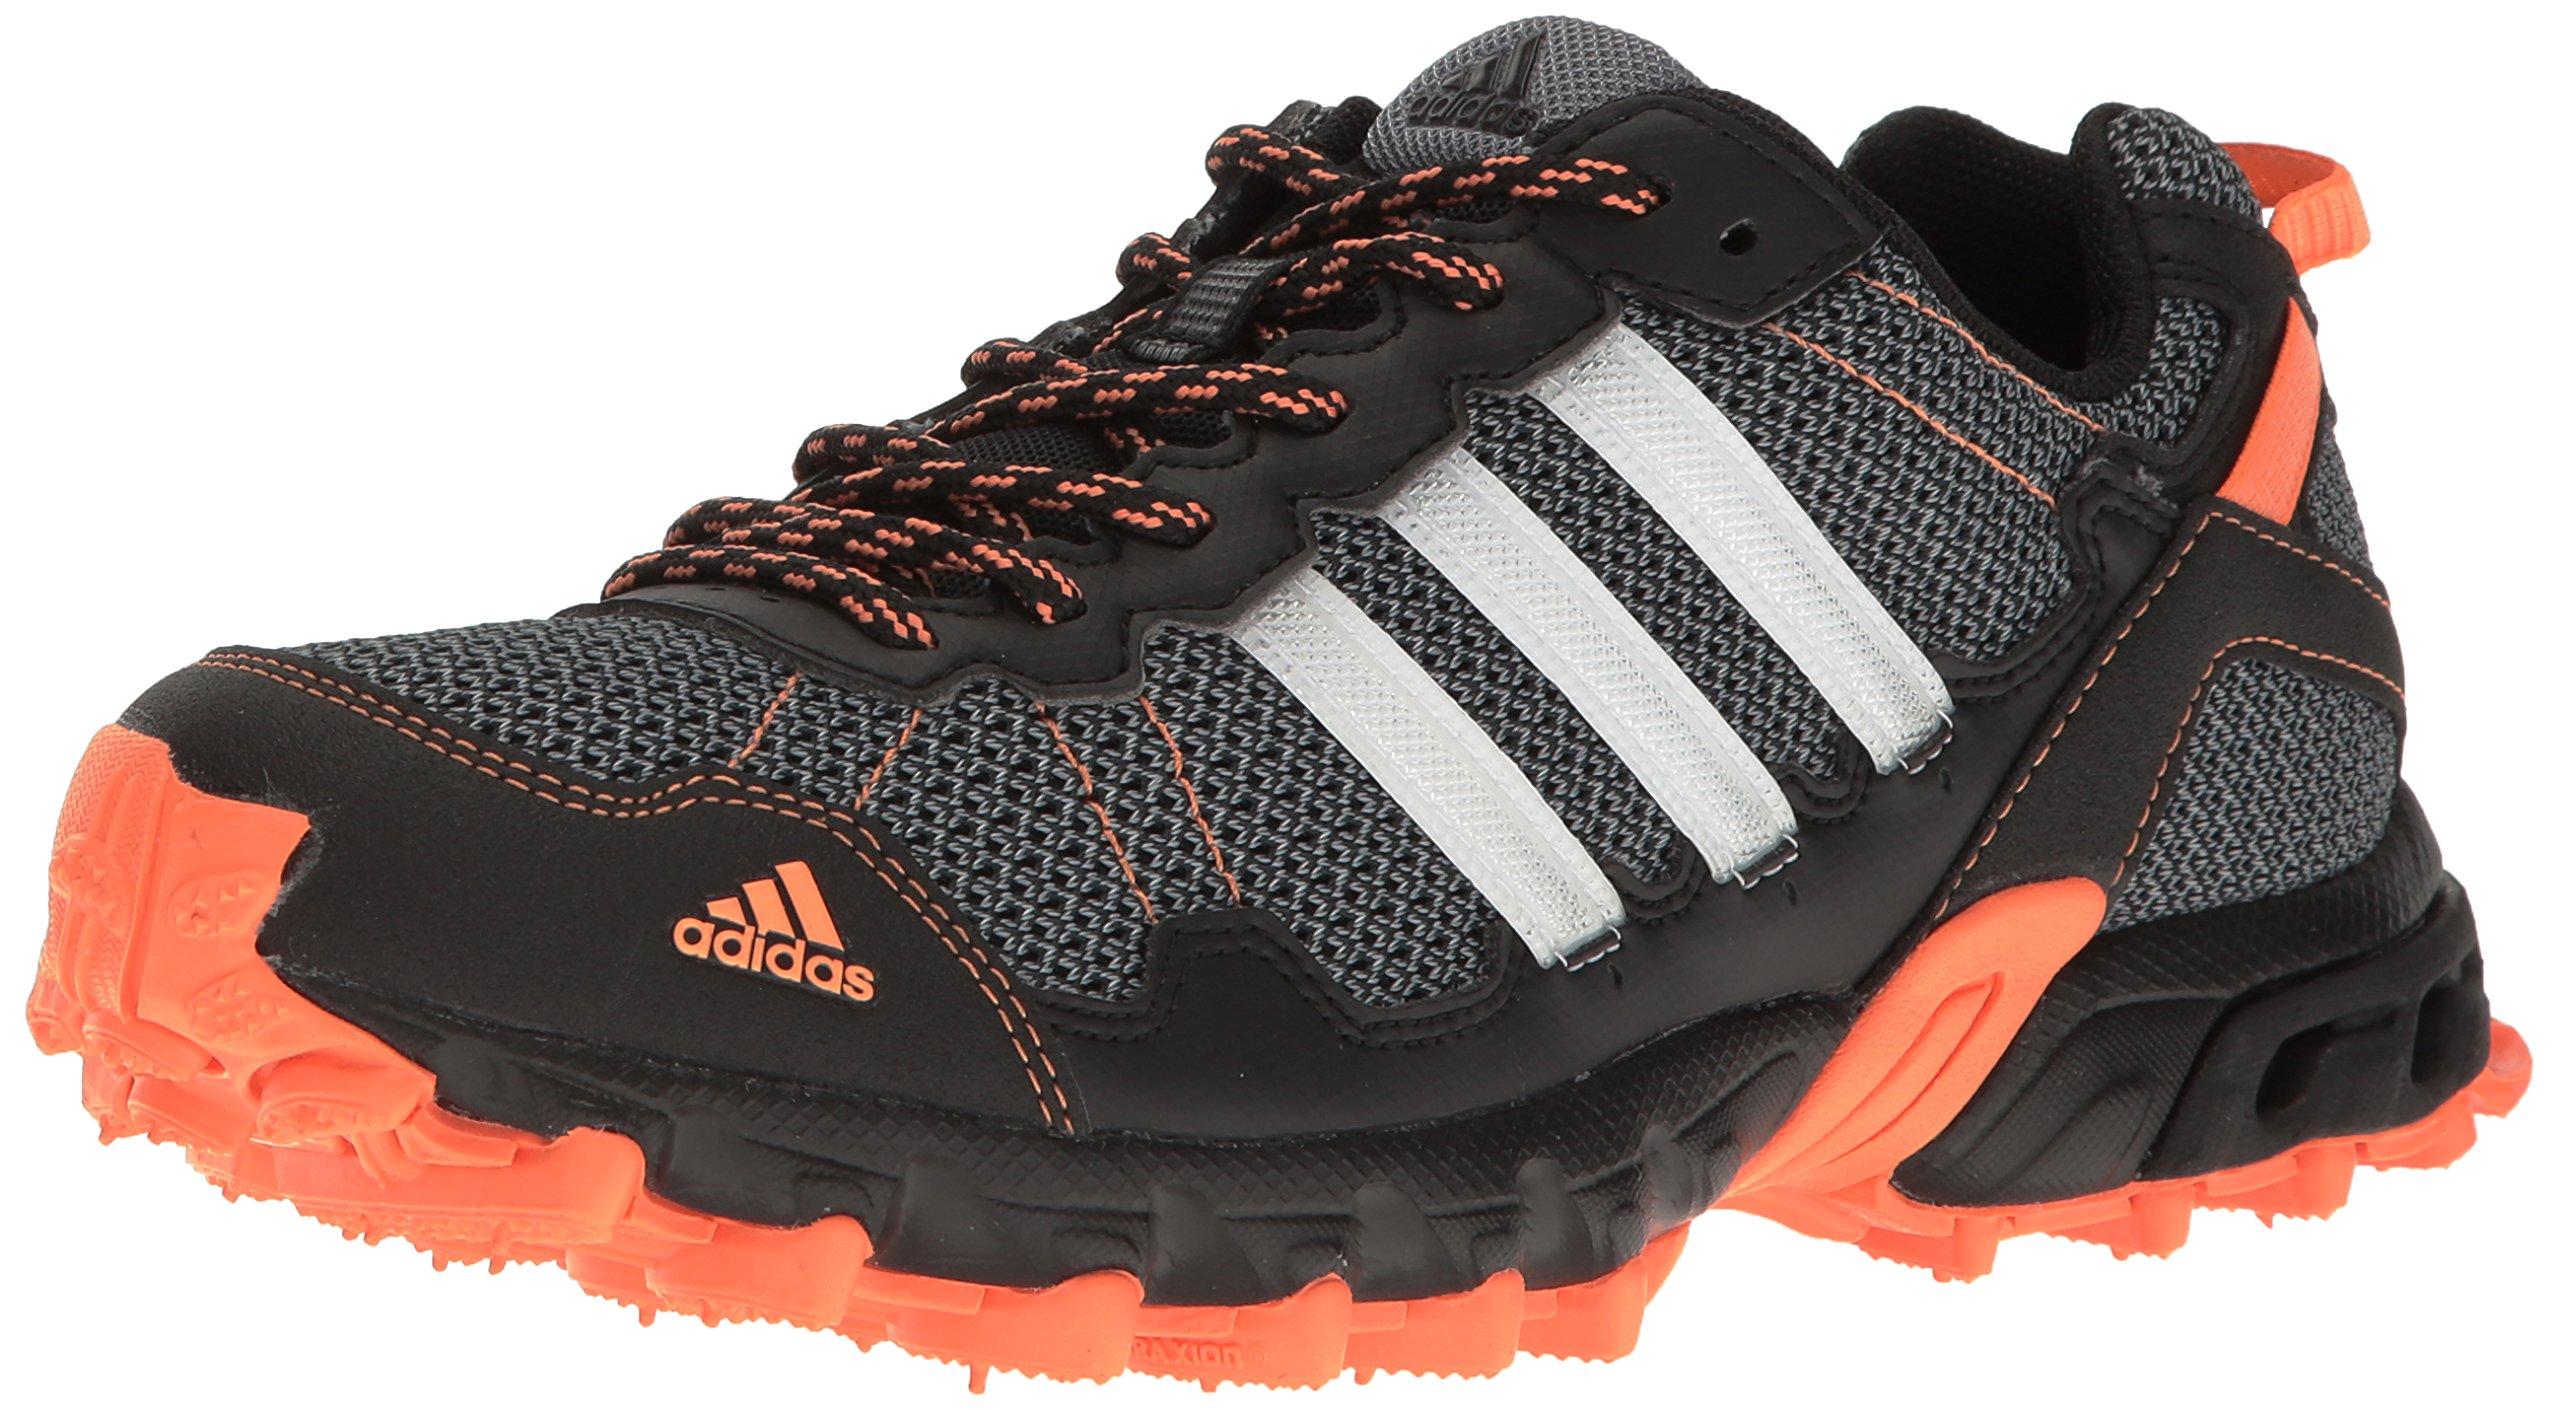 adidas Women's Rockadia Trail W Running Shoe, Black/White/Easy Orange, 7 M US by adidas (Image #1)